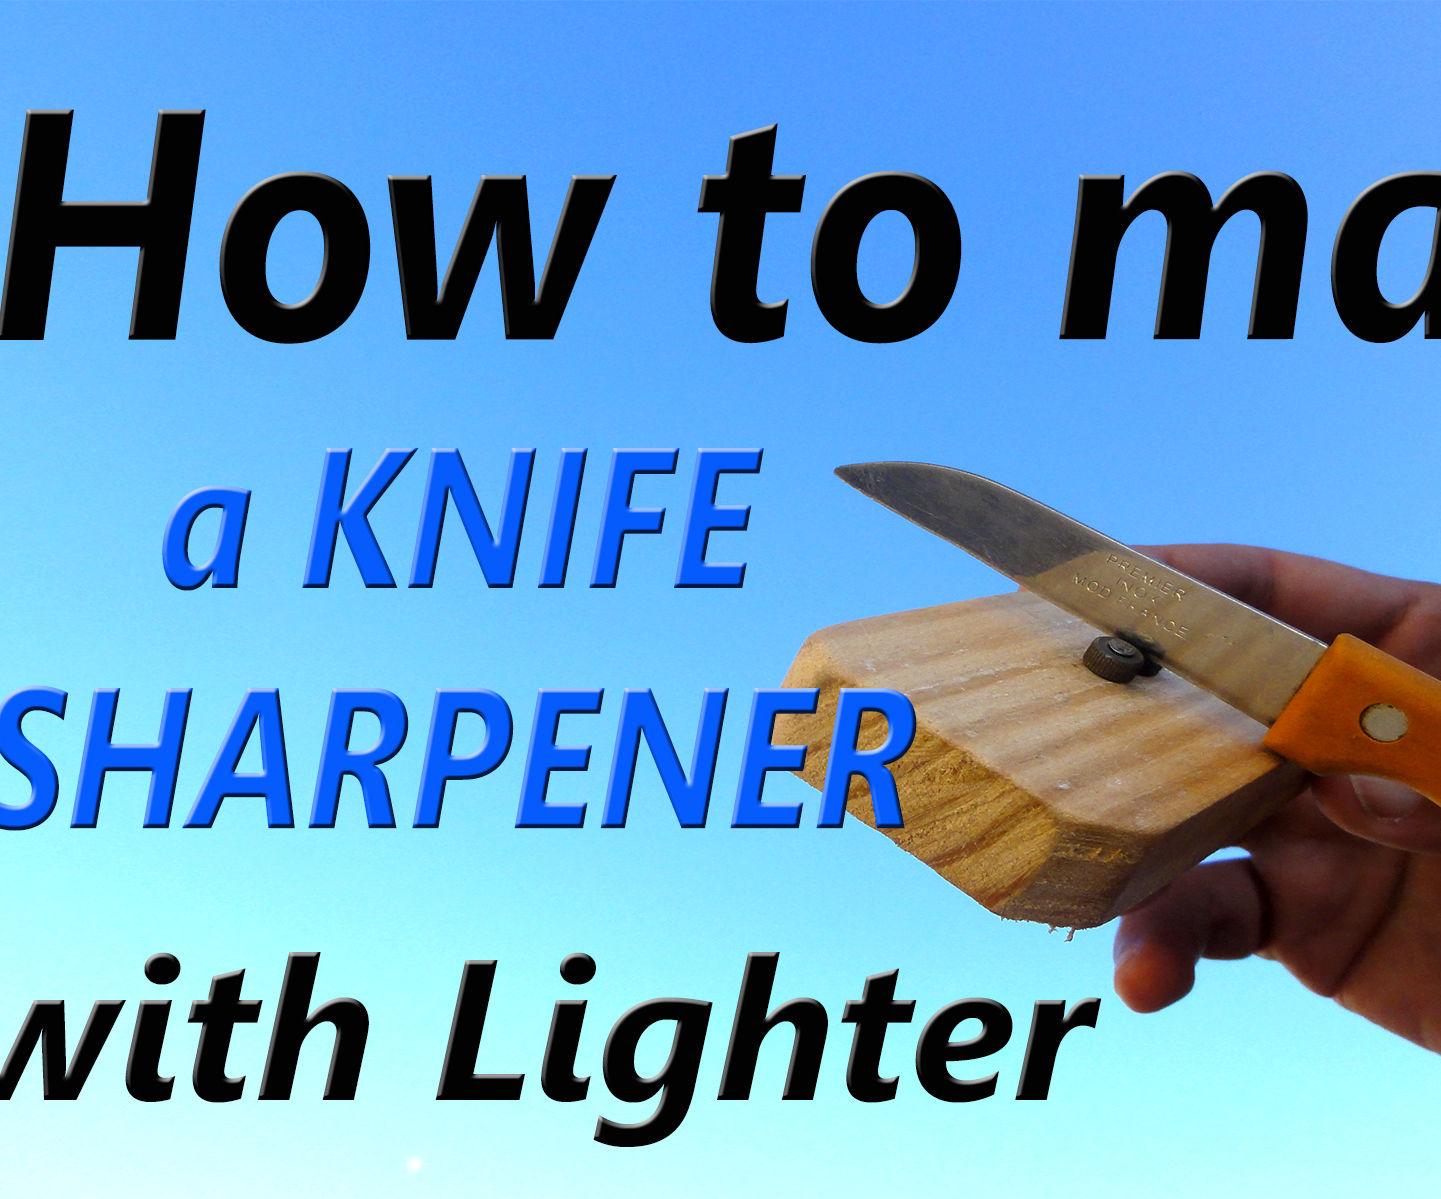 How to make a KNIFE SHARPENER with Lighter Life Hacks .